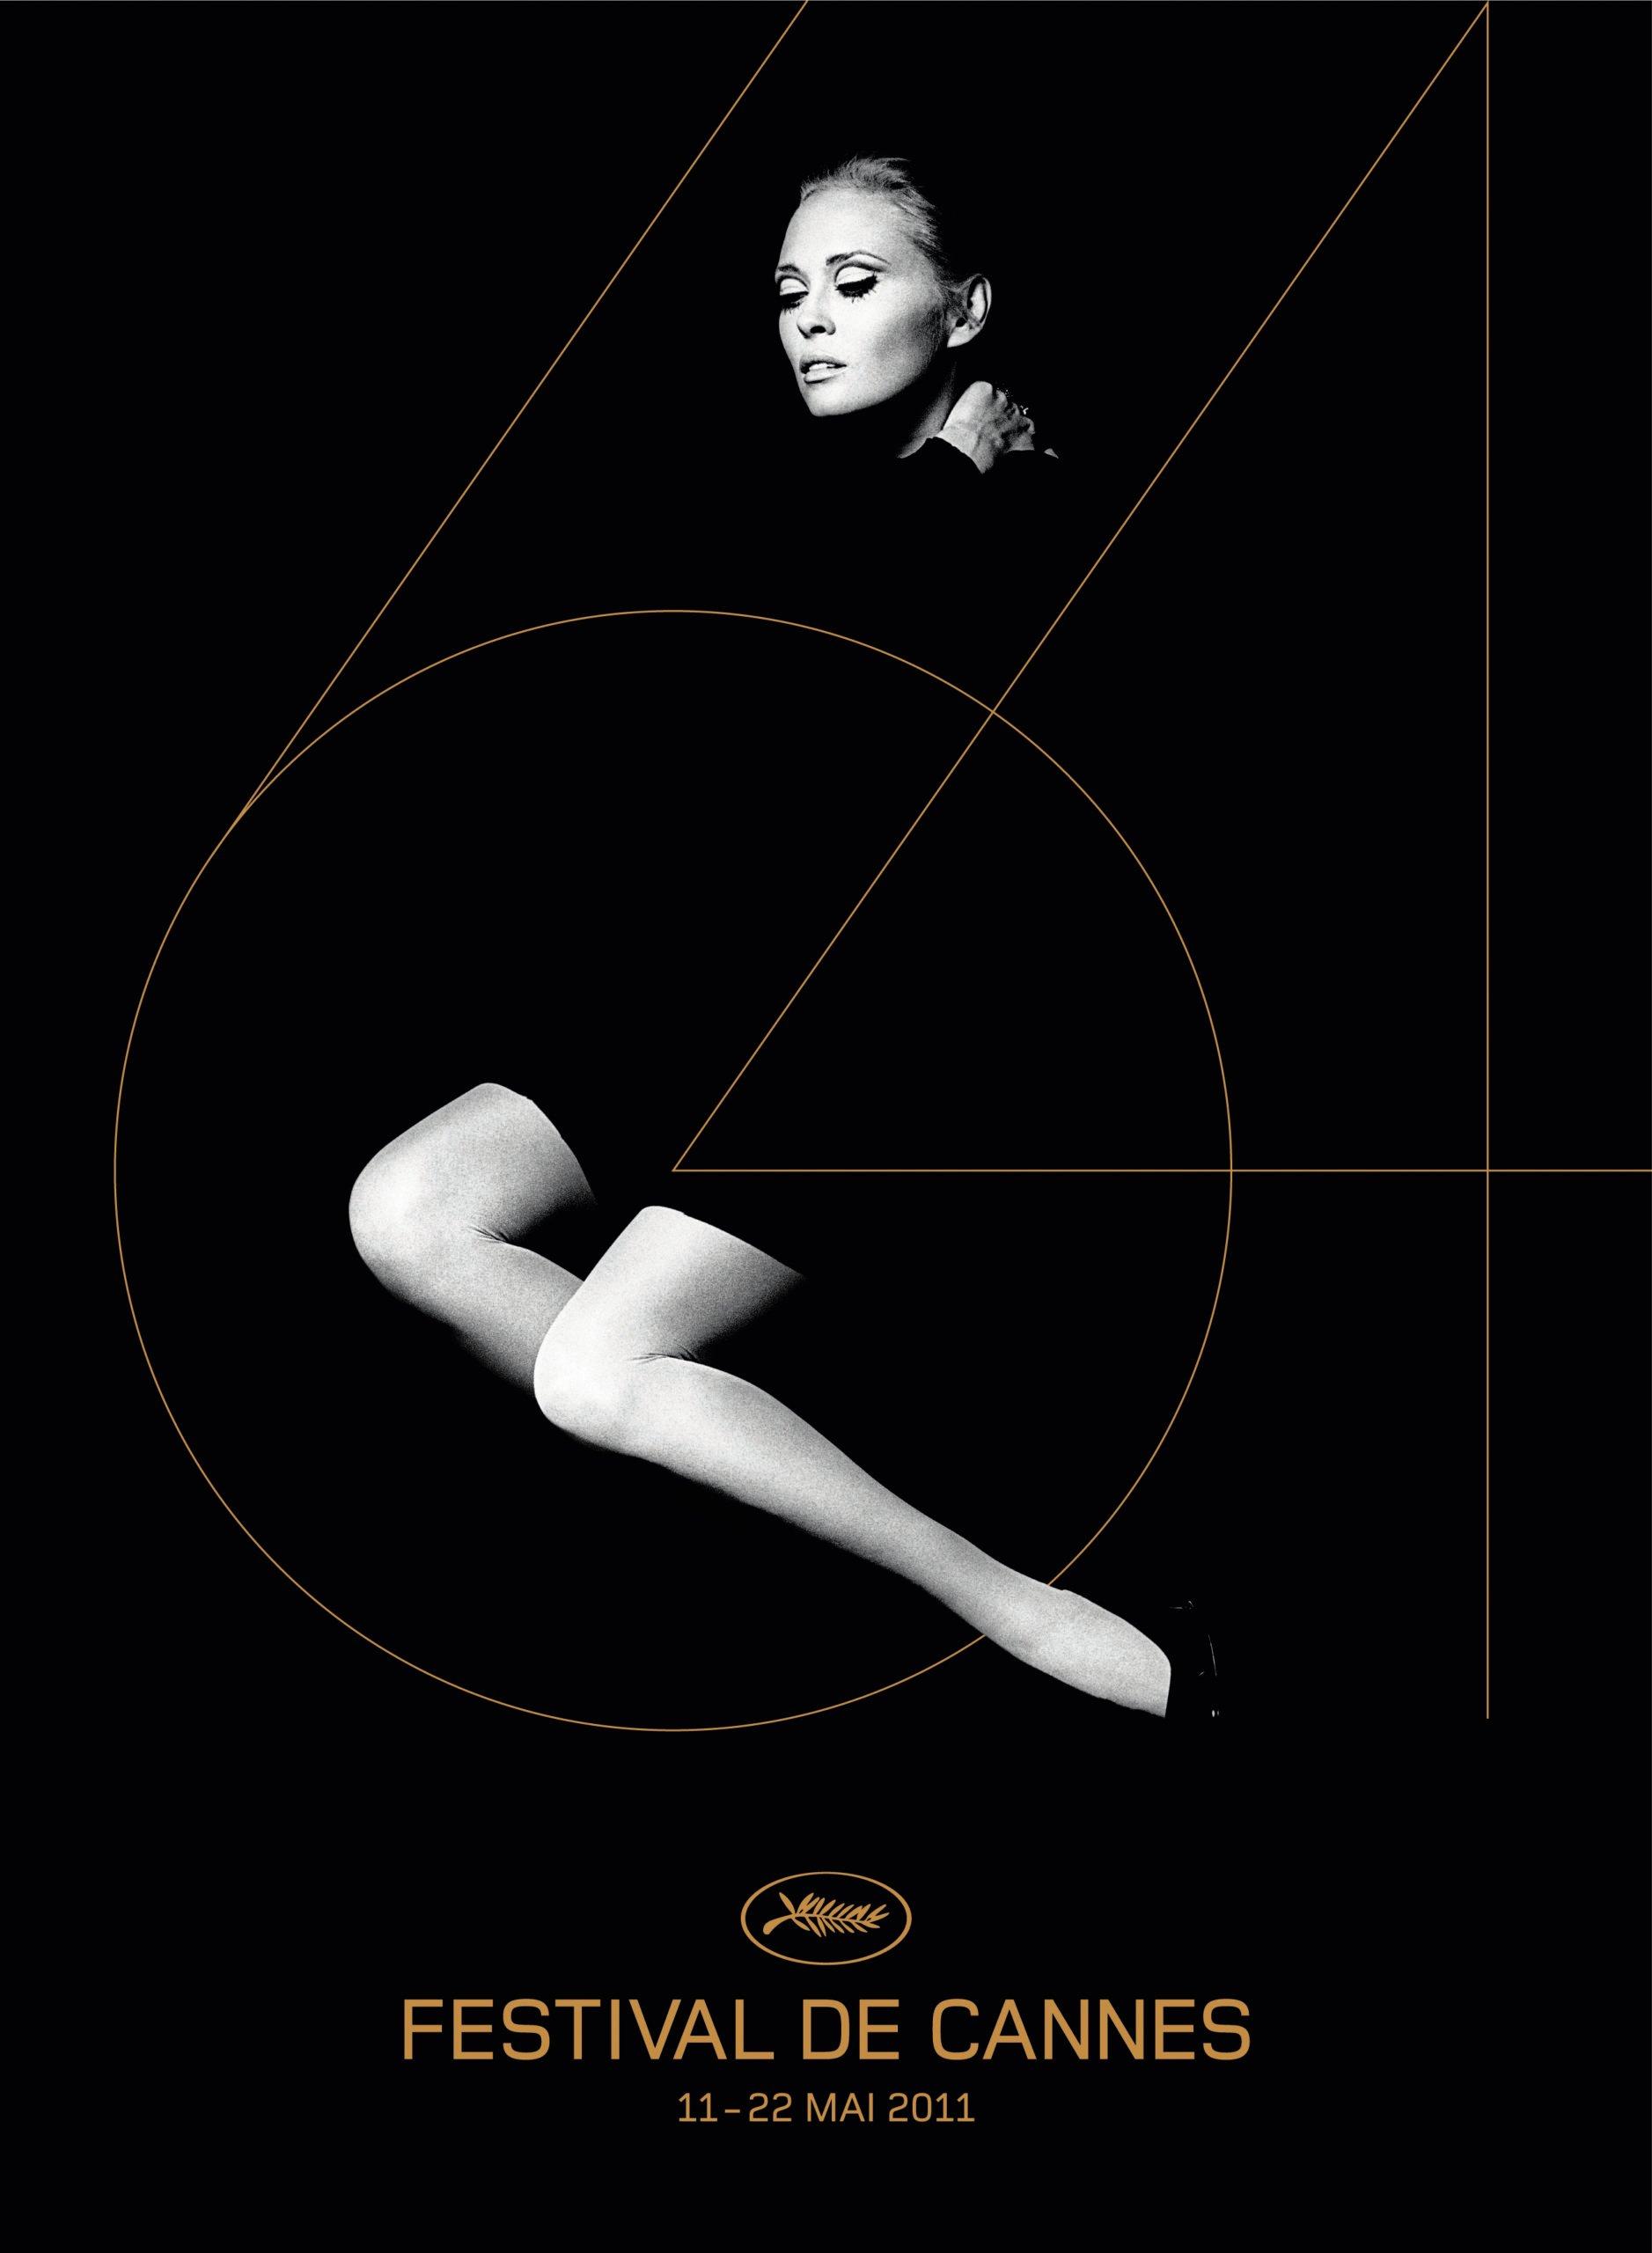 Cannes Film Festival 2011: The Long Run